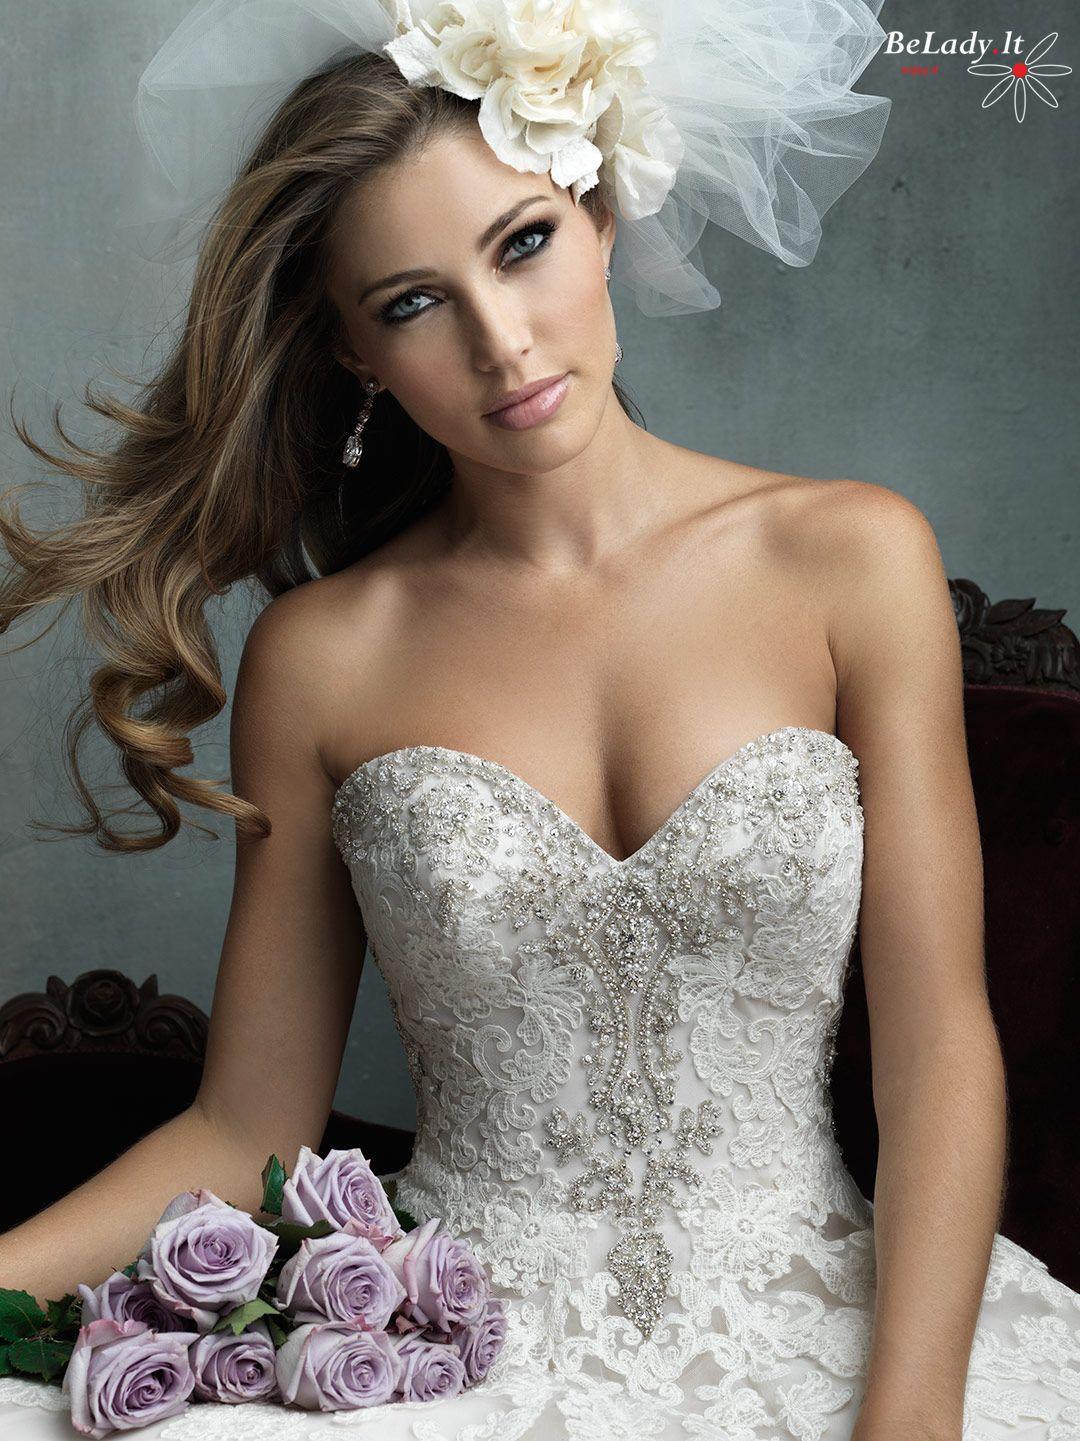 Prabangi vestuvinė suknelė Vilniuje